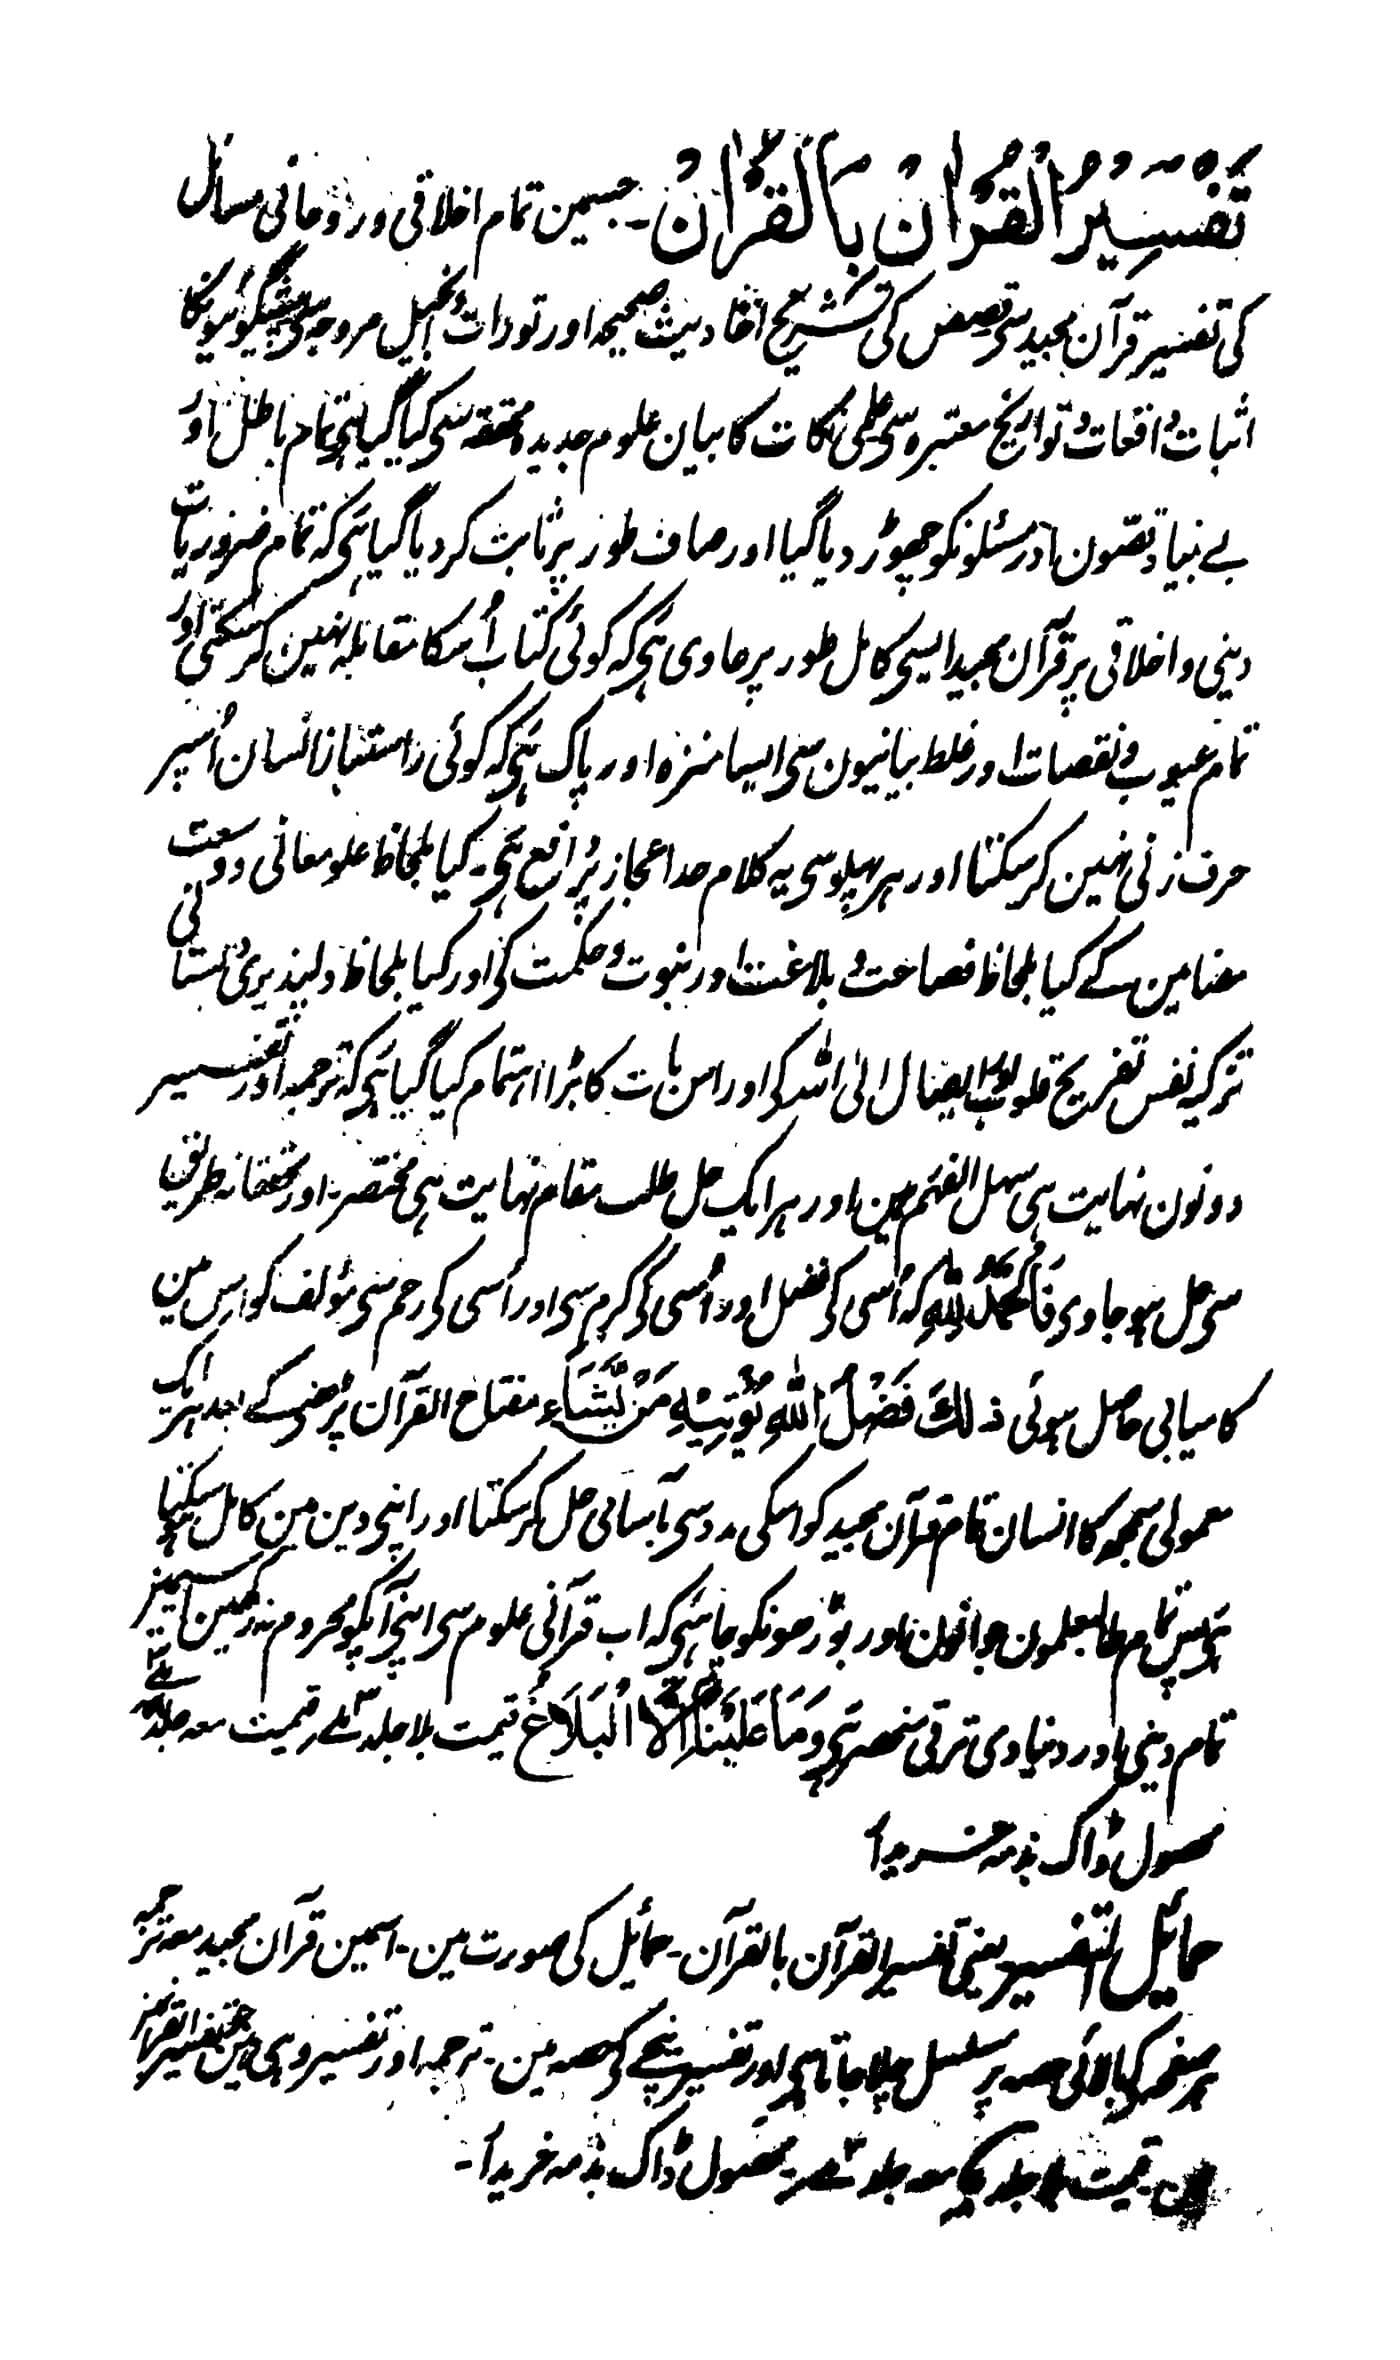 Mohammad Khan 1905 Quran Explorer, Page 3